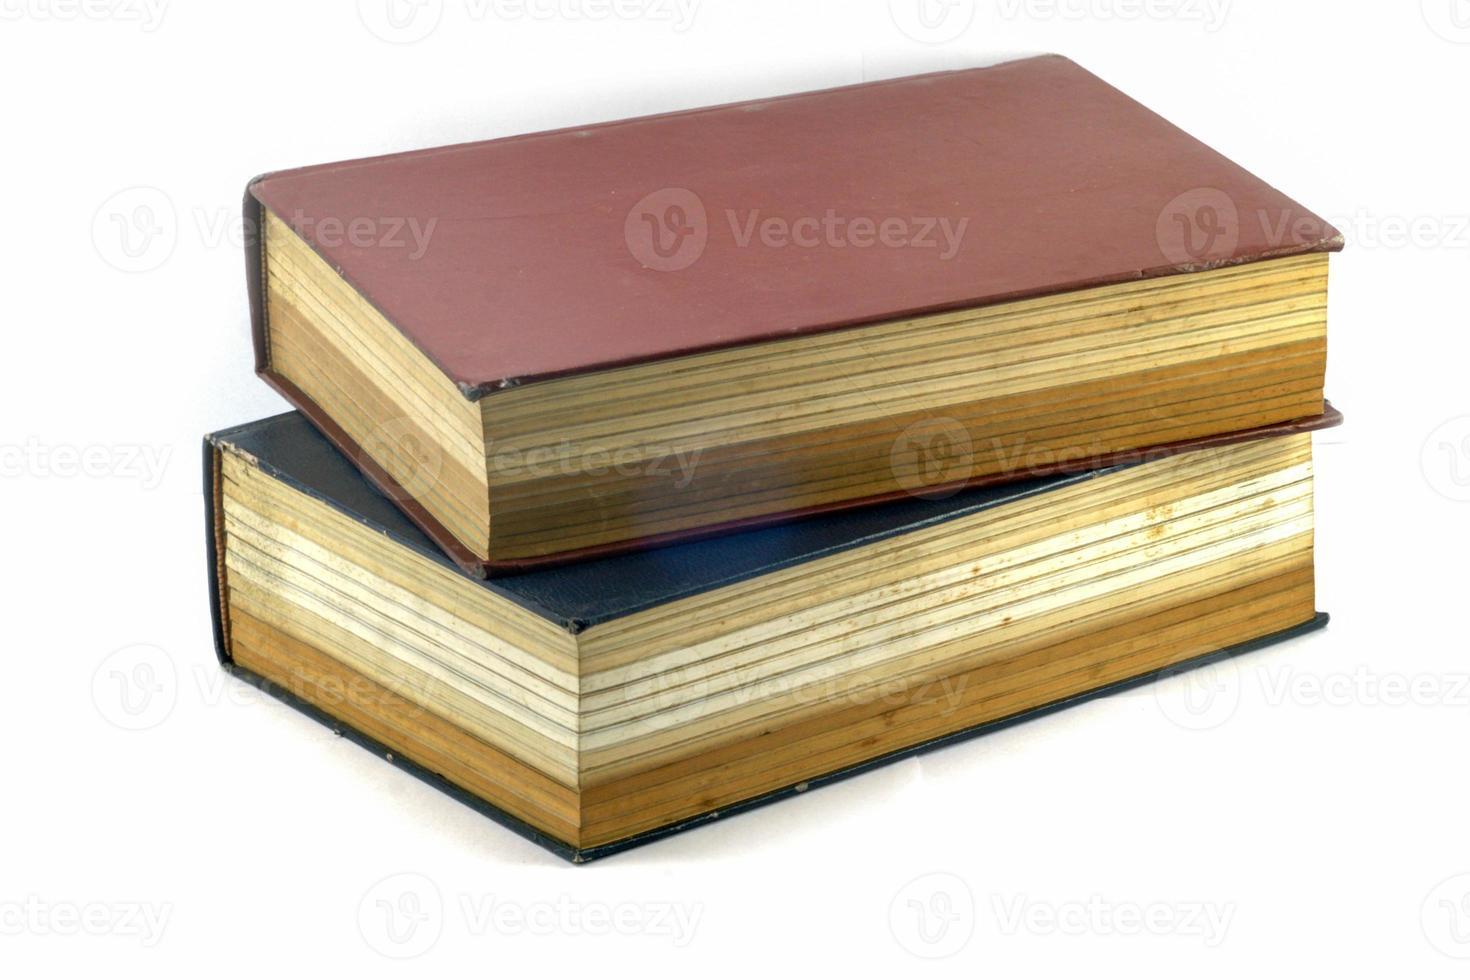 vieux manuels ou bible photo